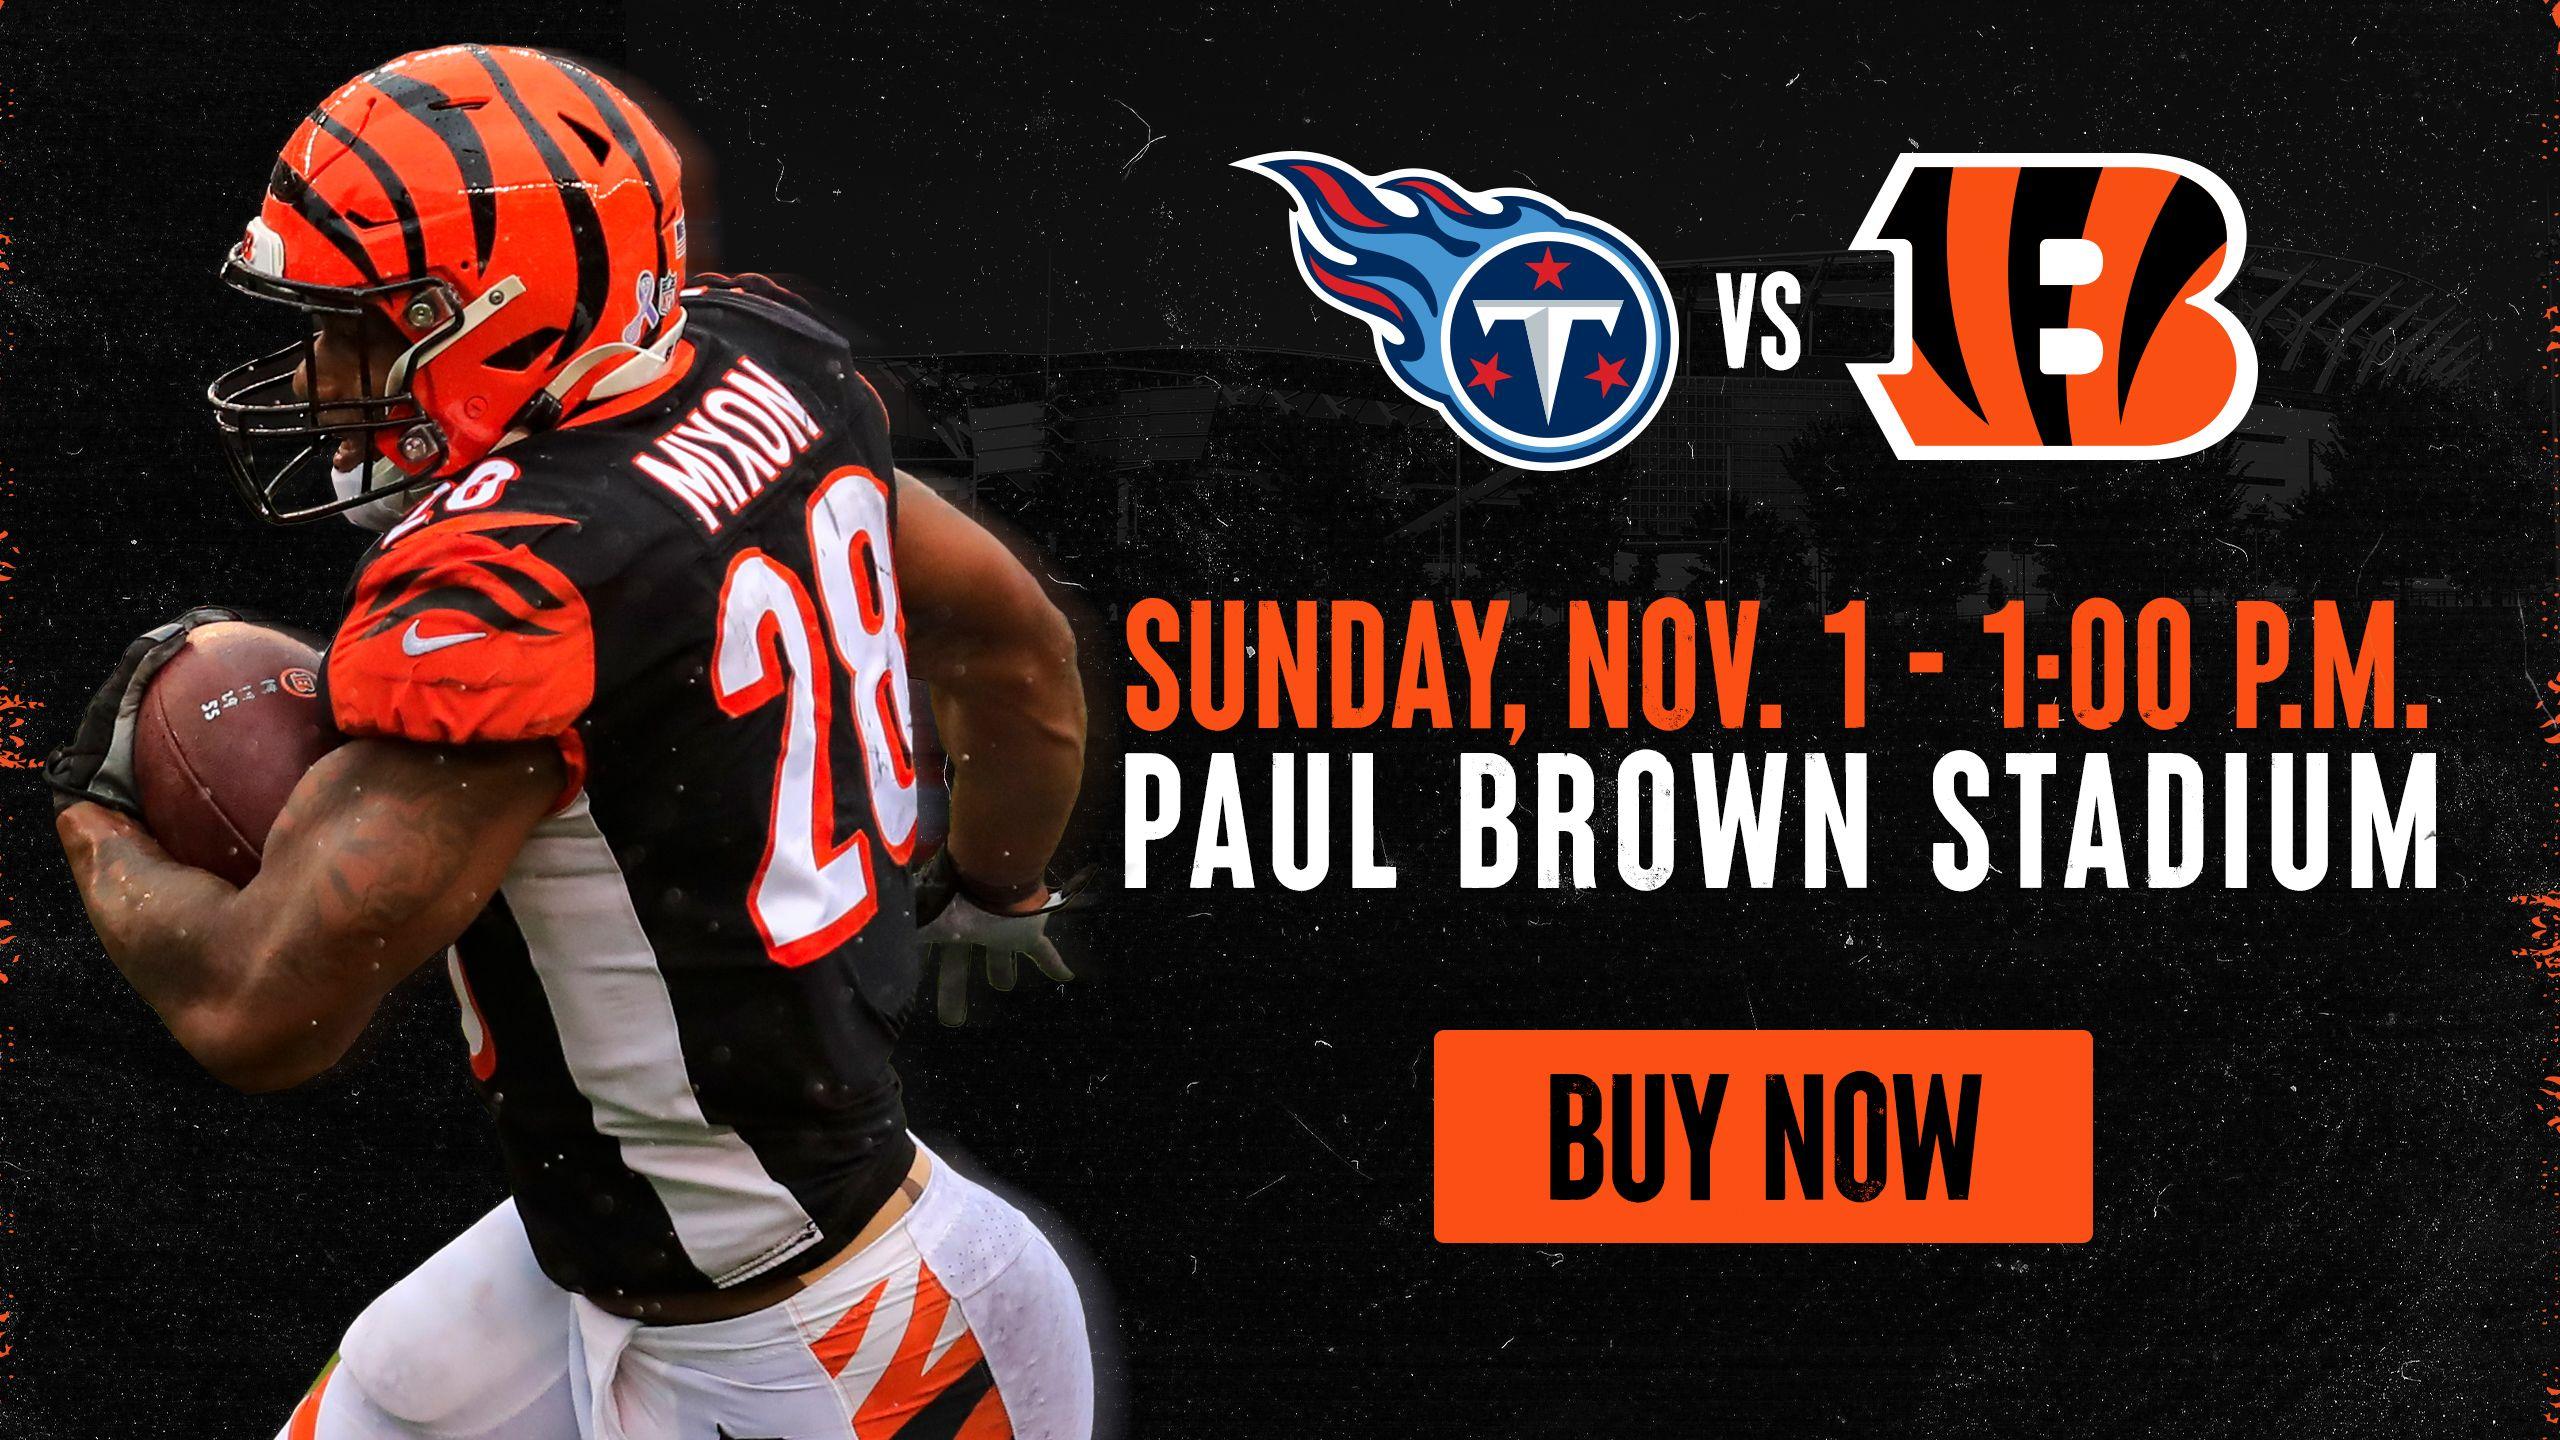 Titans vs. Bengals   Sunday, Nov. 1 - 1 p.m.